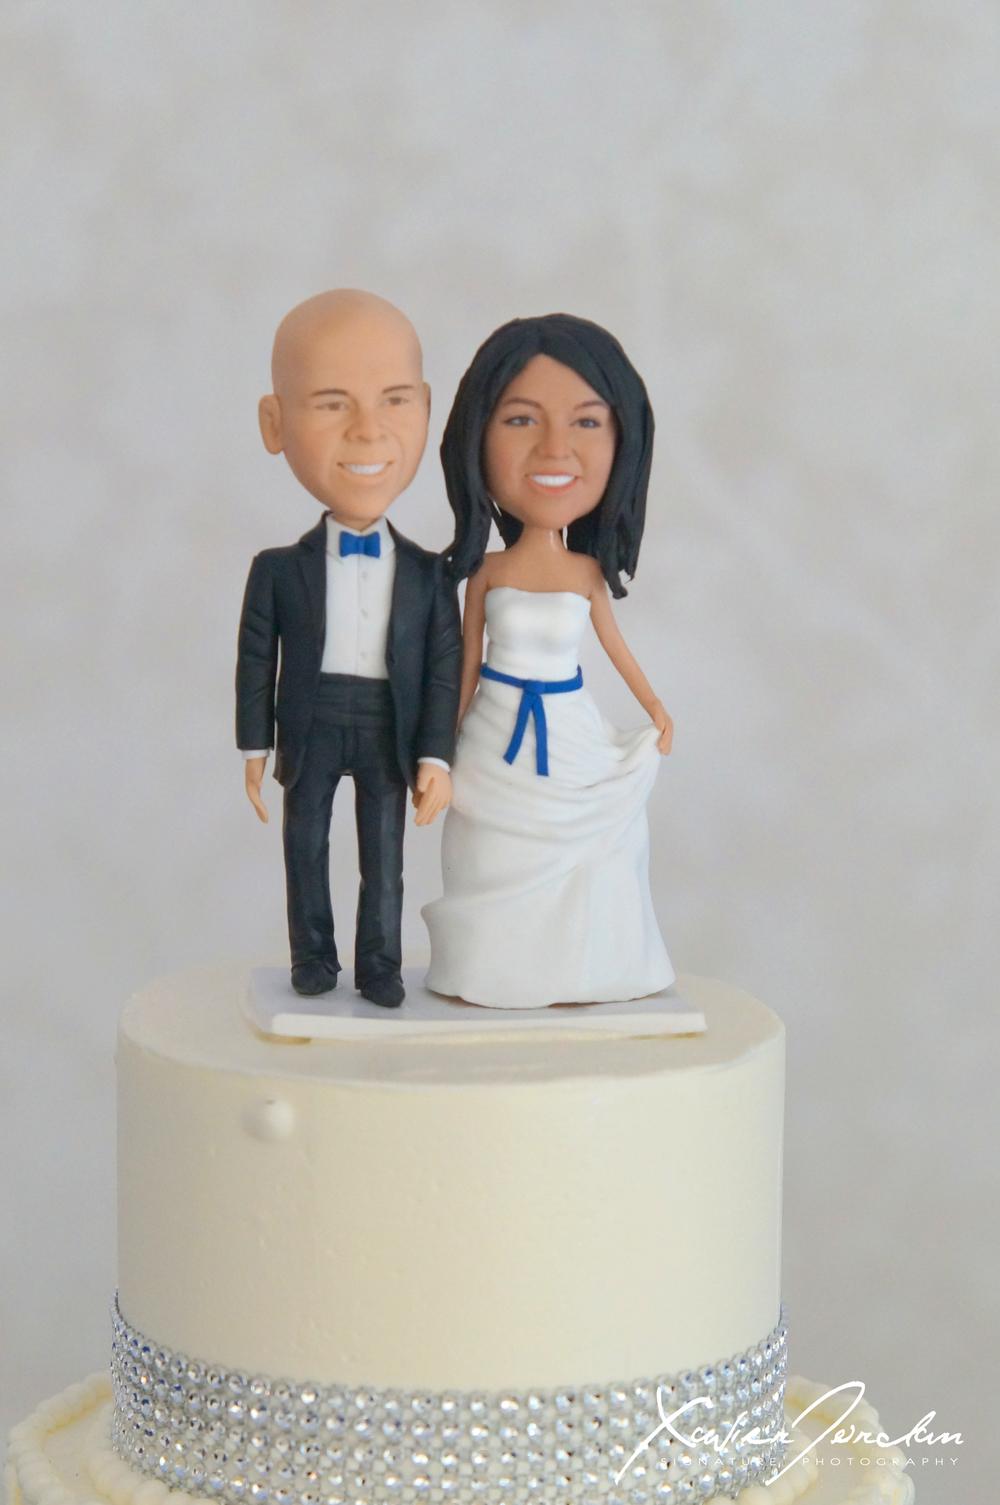 WEDDING CUSTOM EDITS